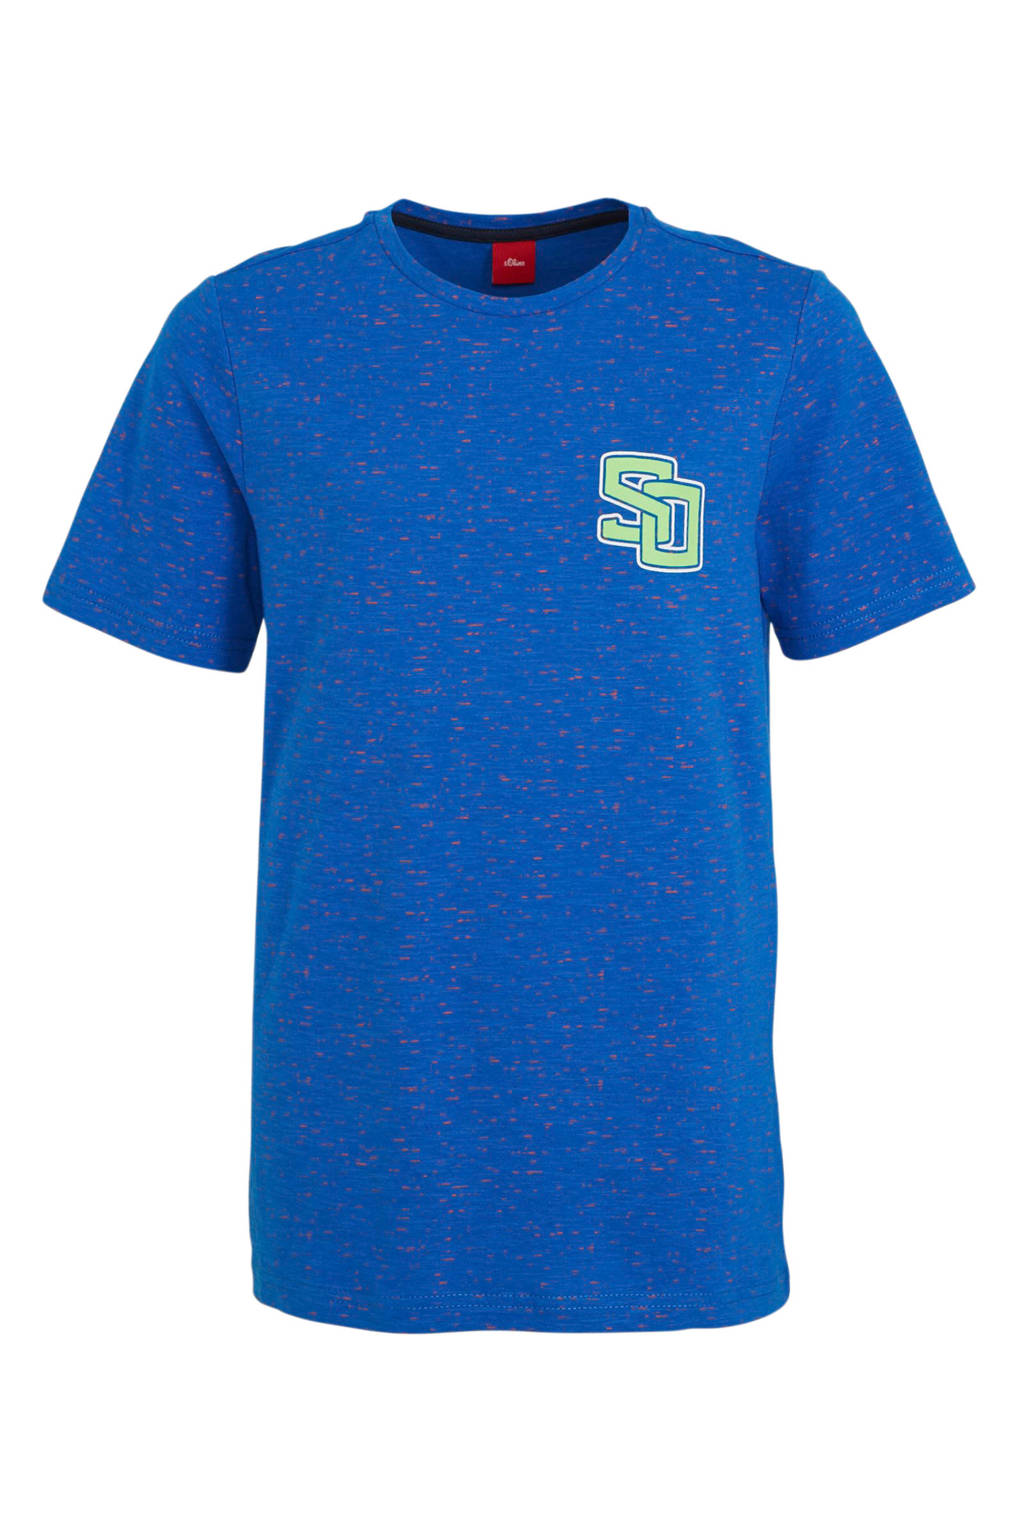 s.Oliver gemêleerd T-shirt blauw/groen, Blauw/groen